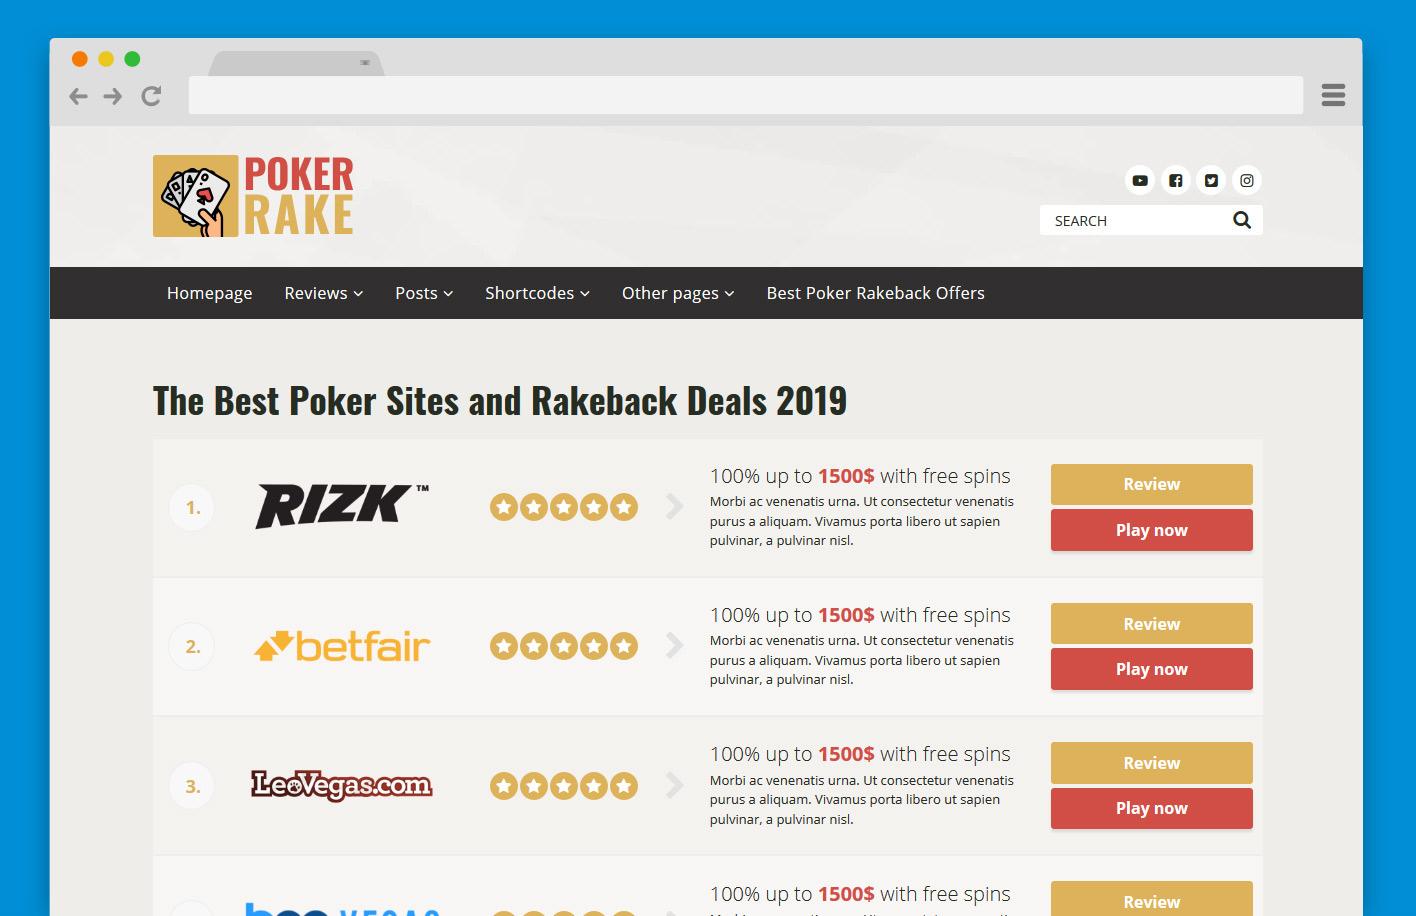 PokerRake